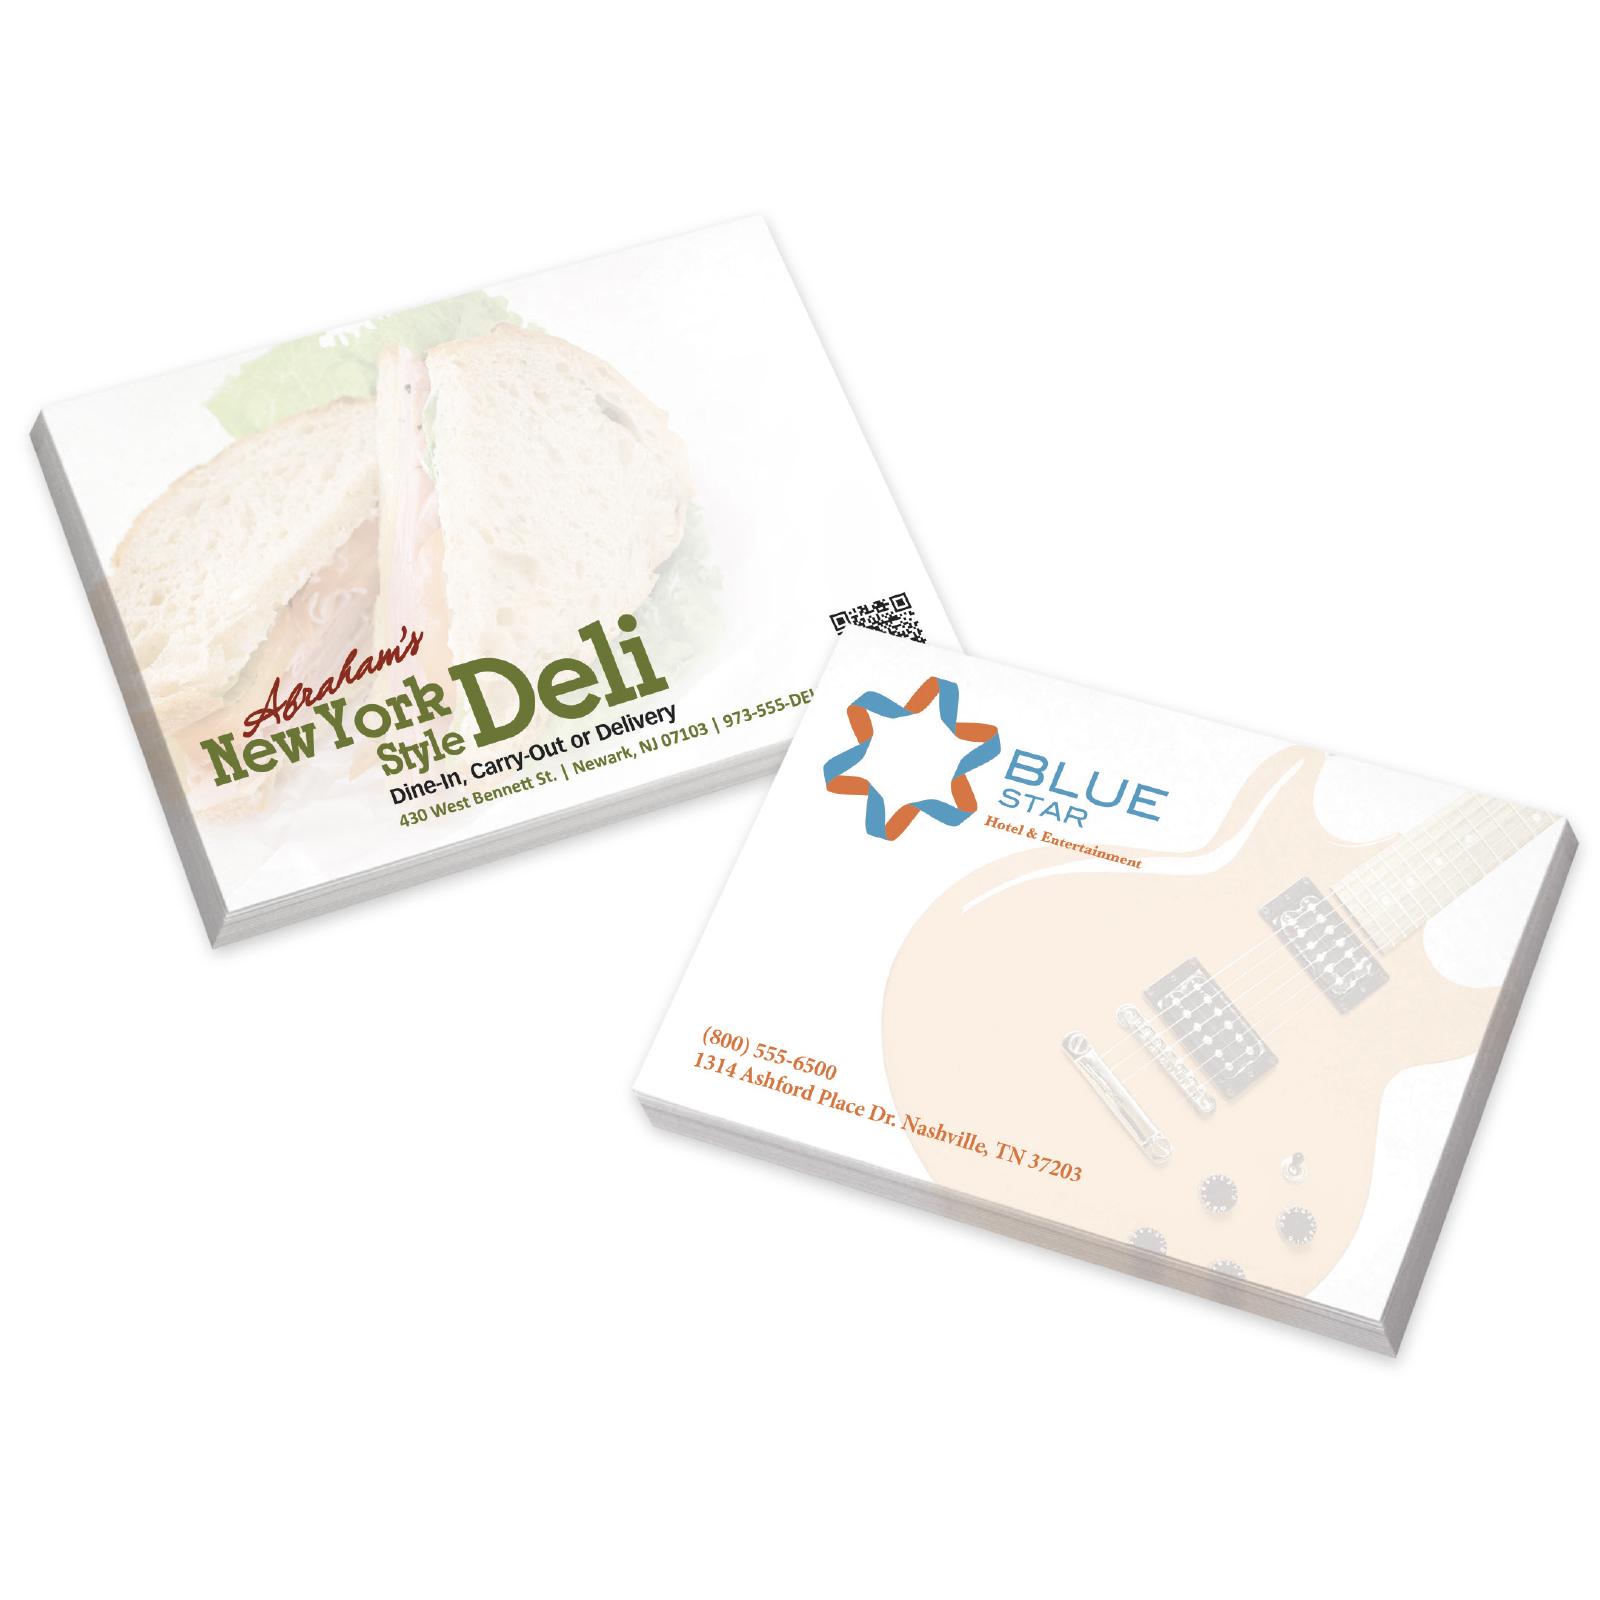 "BIC Adhesive 25 Sheet Notepad (4""x3"") - Full Colour Imprint"